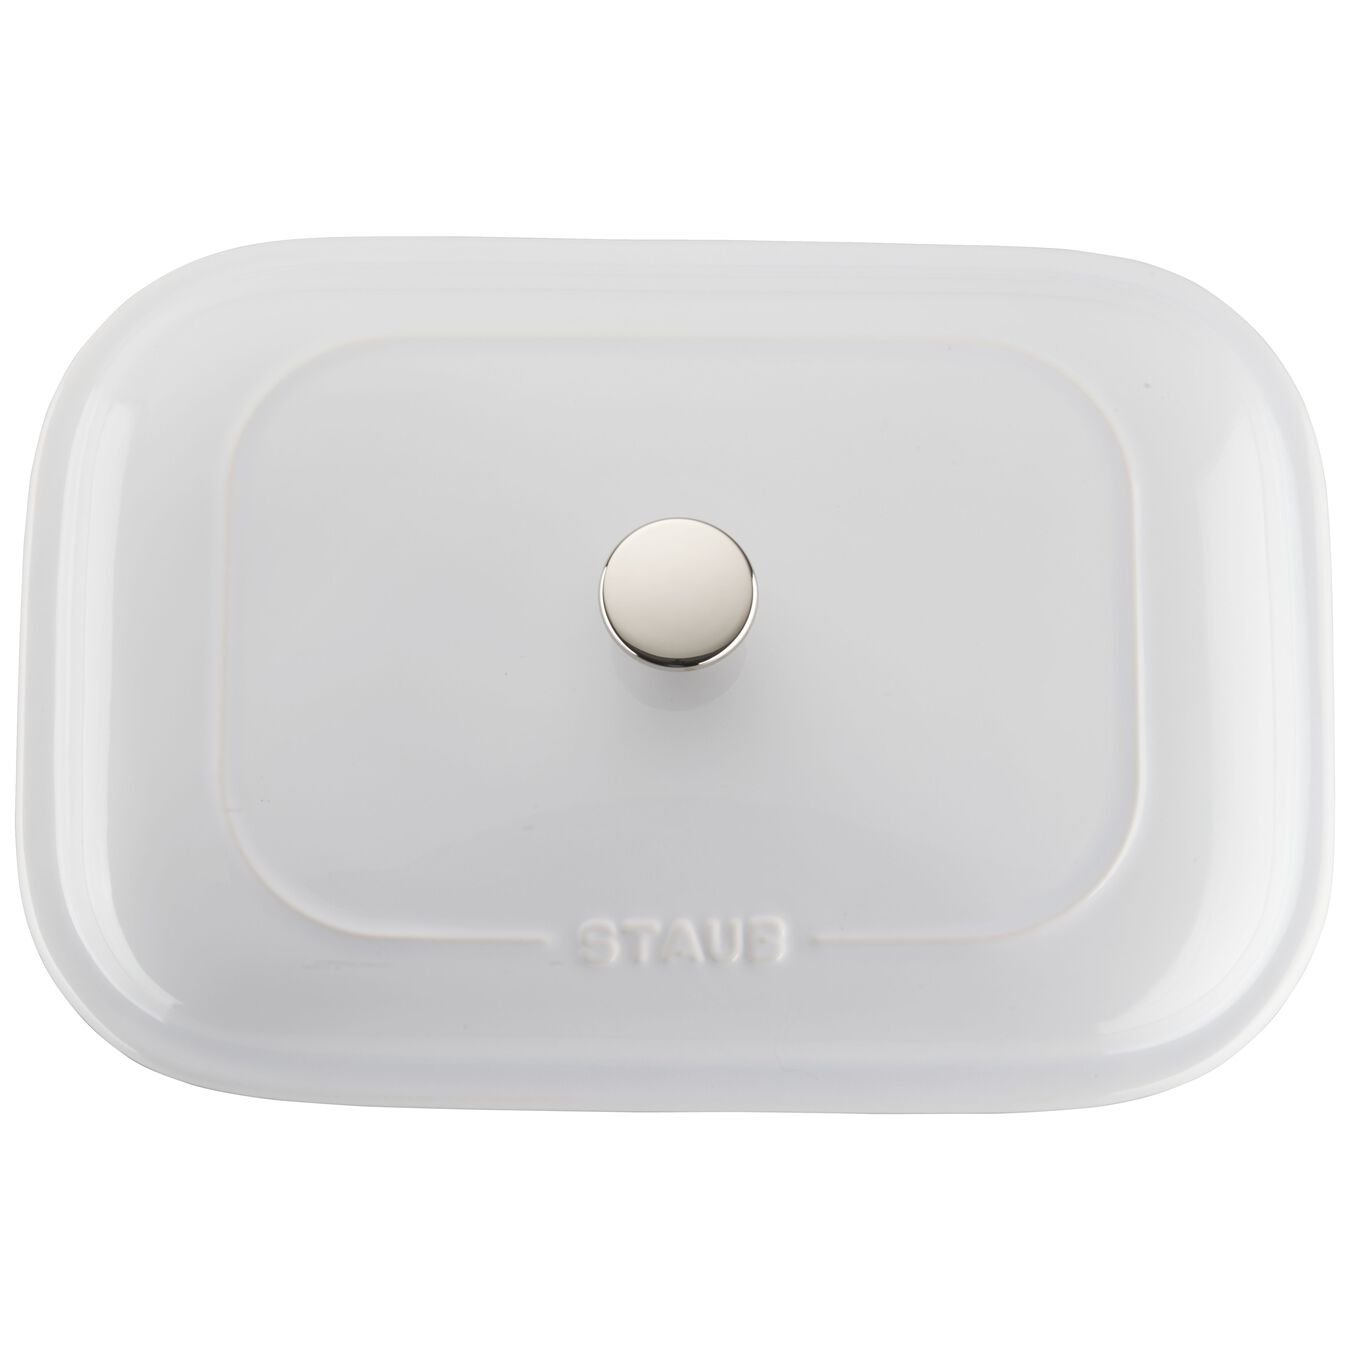 12-inch x 8-inch Rectangular Covered Baking Dish - White,,large 4